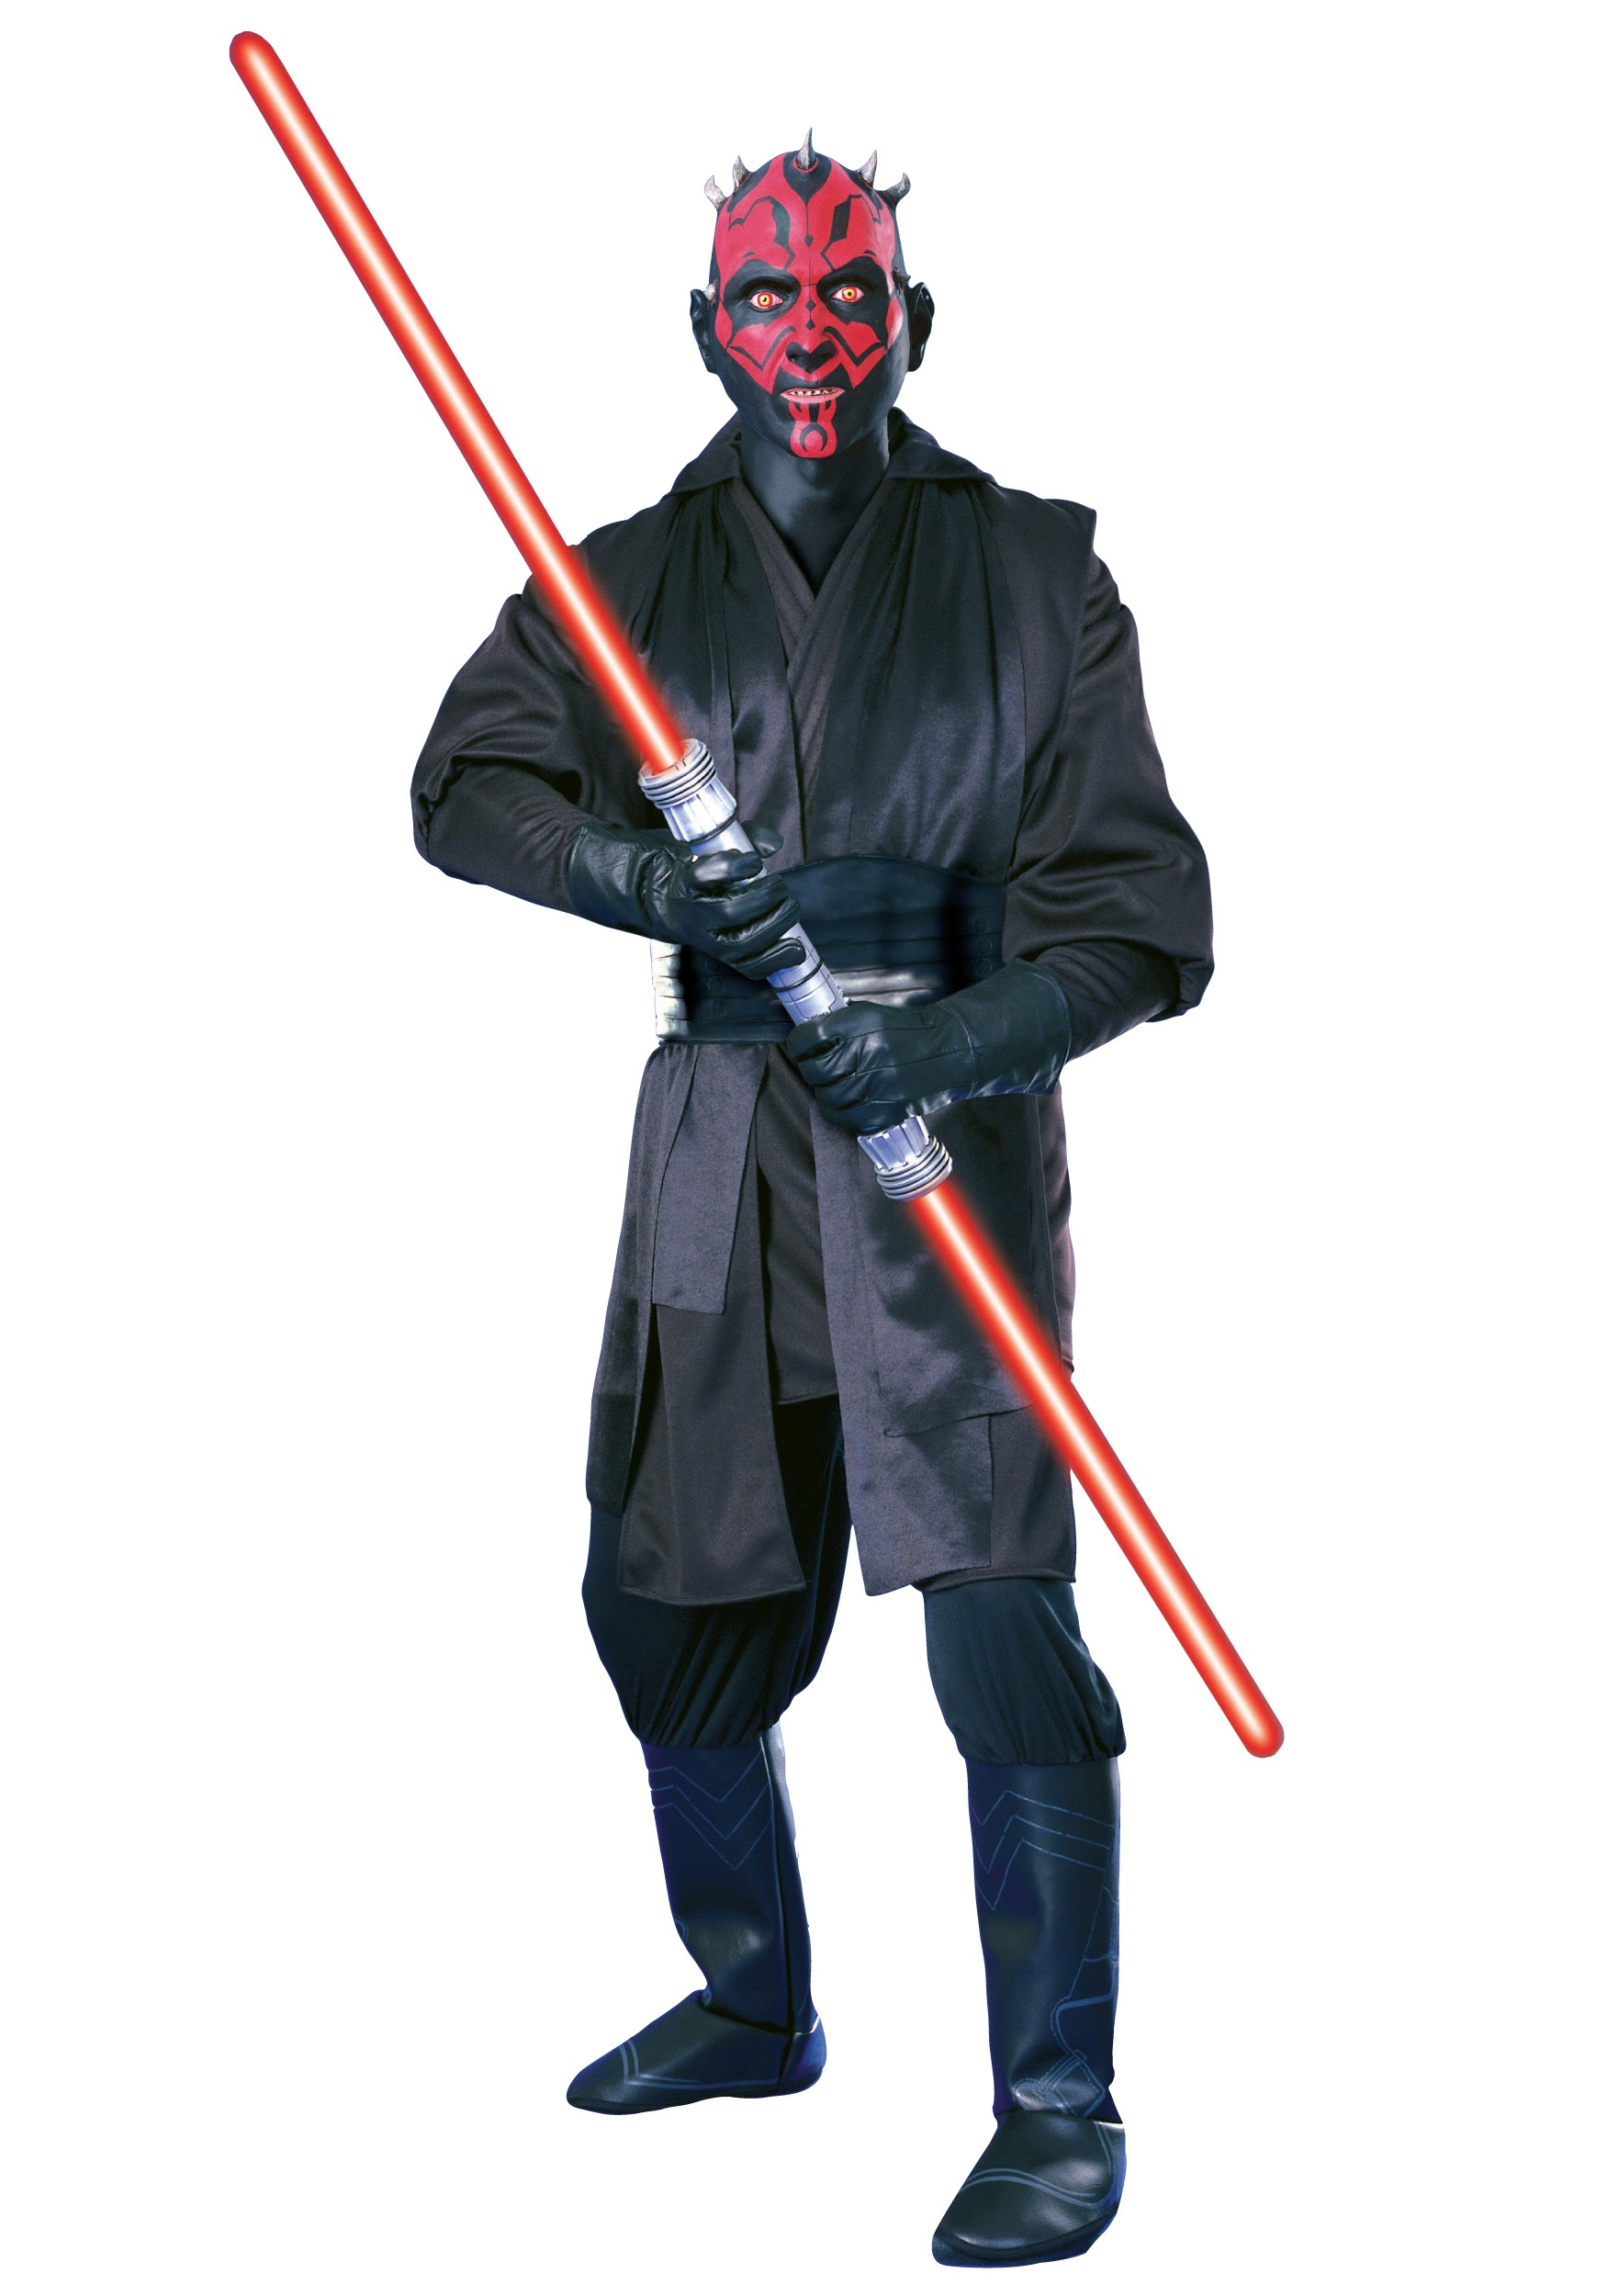 Supreme Darth Maul Adult Costume from Star Wars